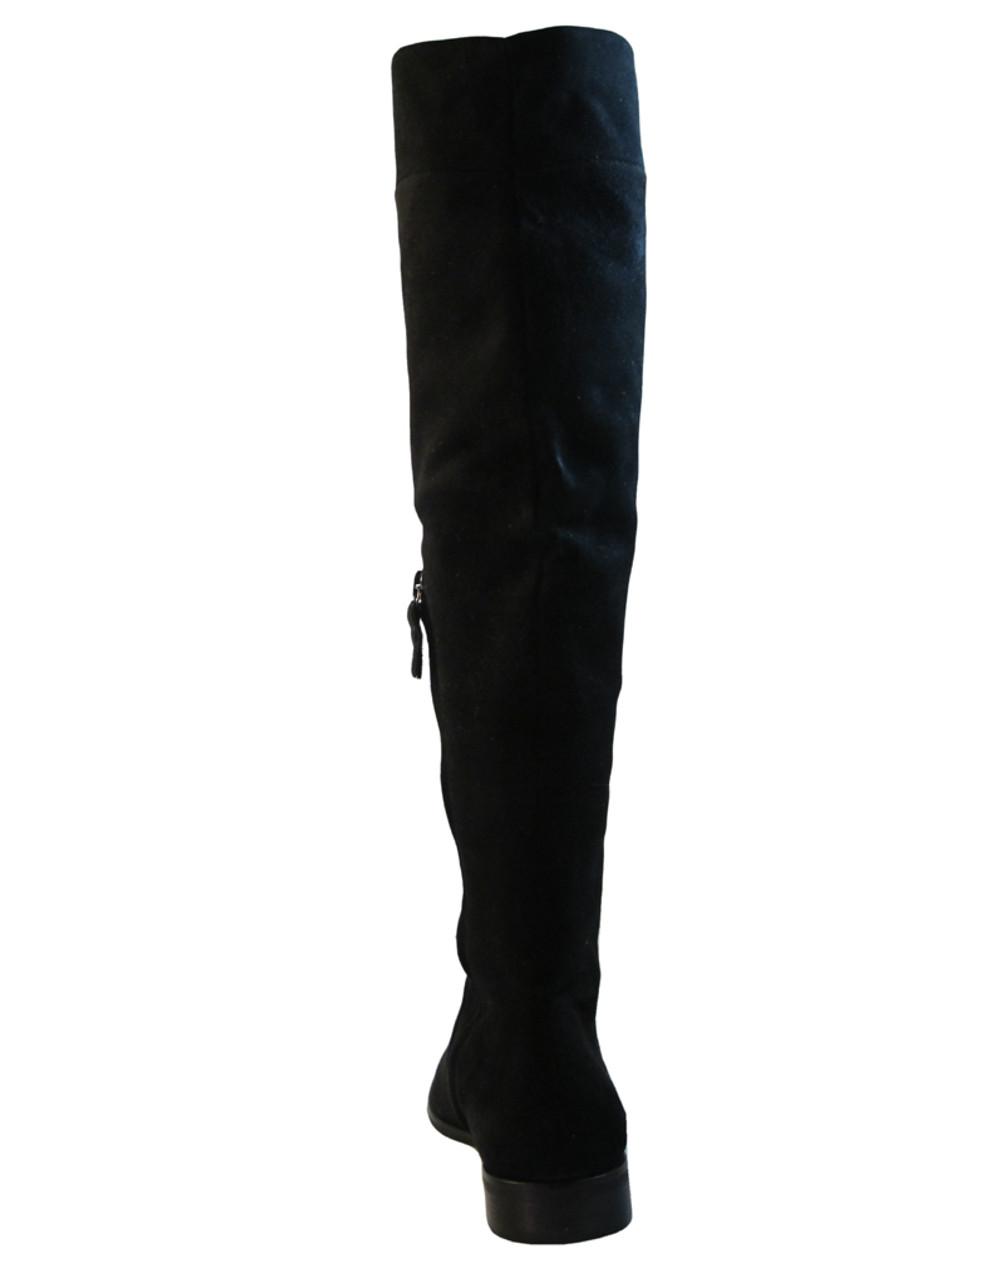 Julie Dee 4467 Women's Italian Designer Knee High Flat Leather Boot